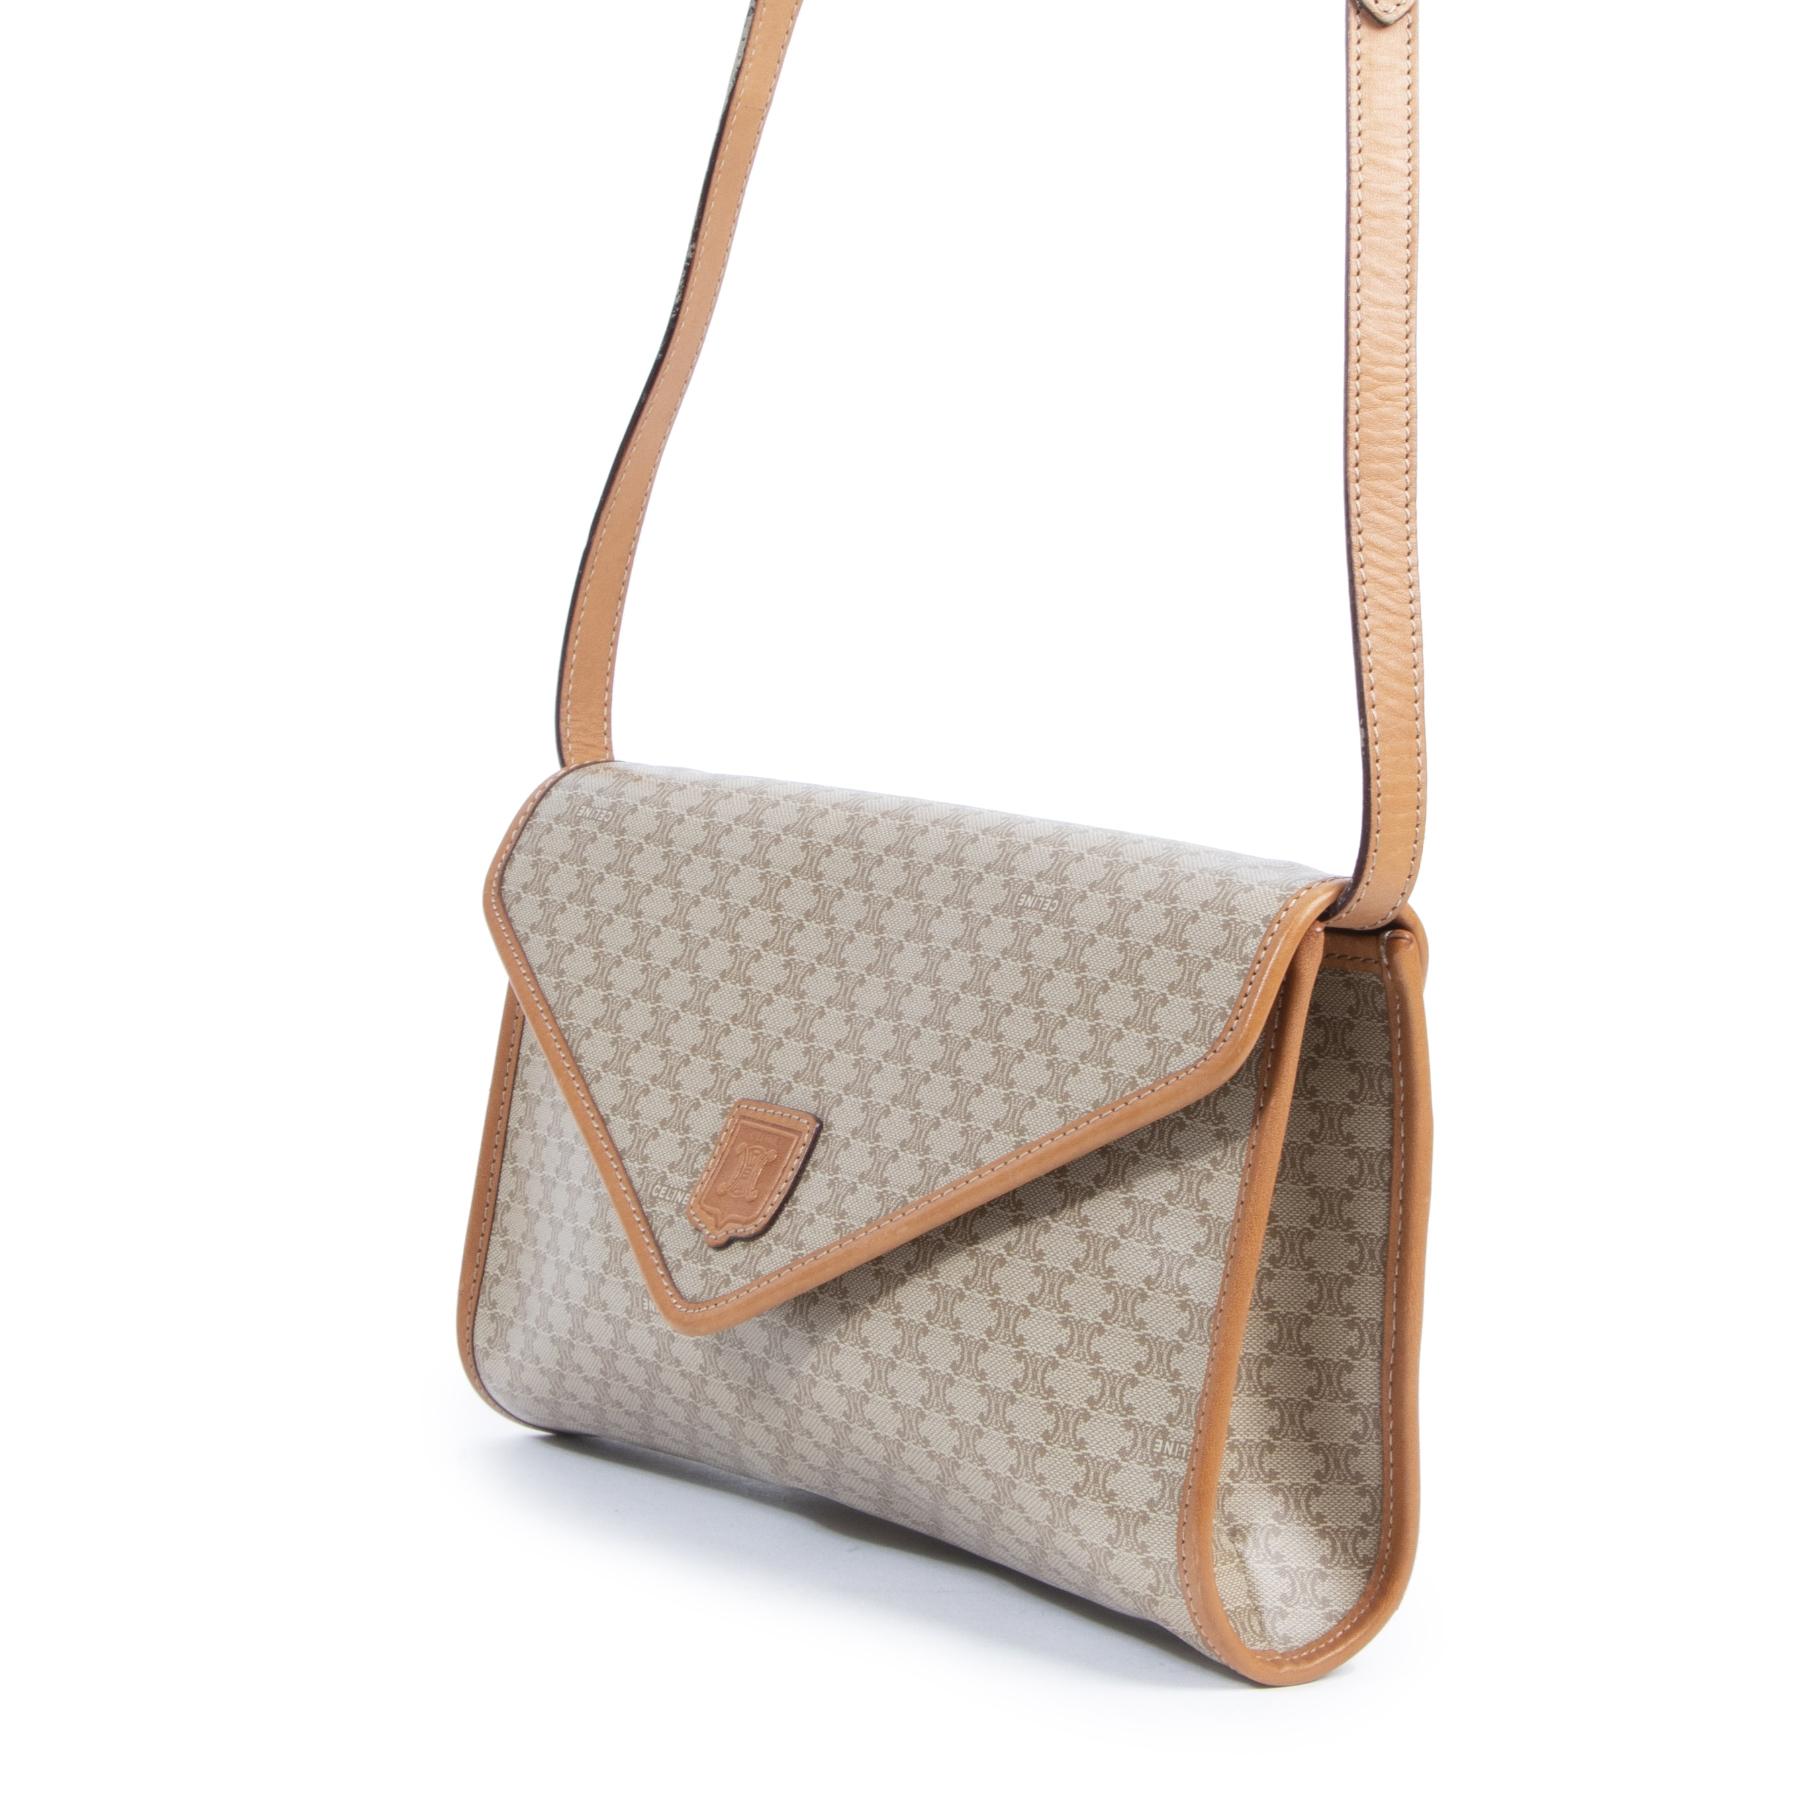 Authentic second-hand vintage Céline Beige Macadam Crossbody Bag buy online webshop LabelLOV